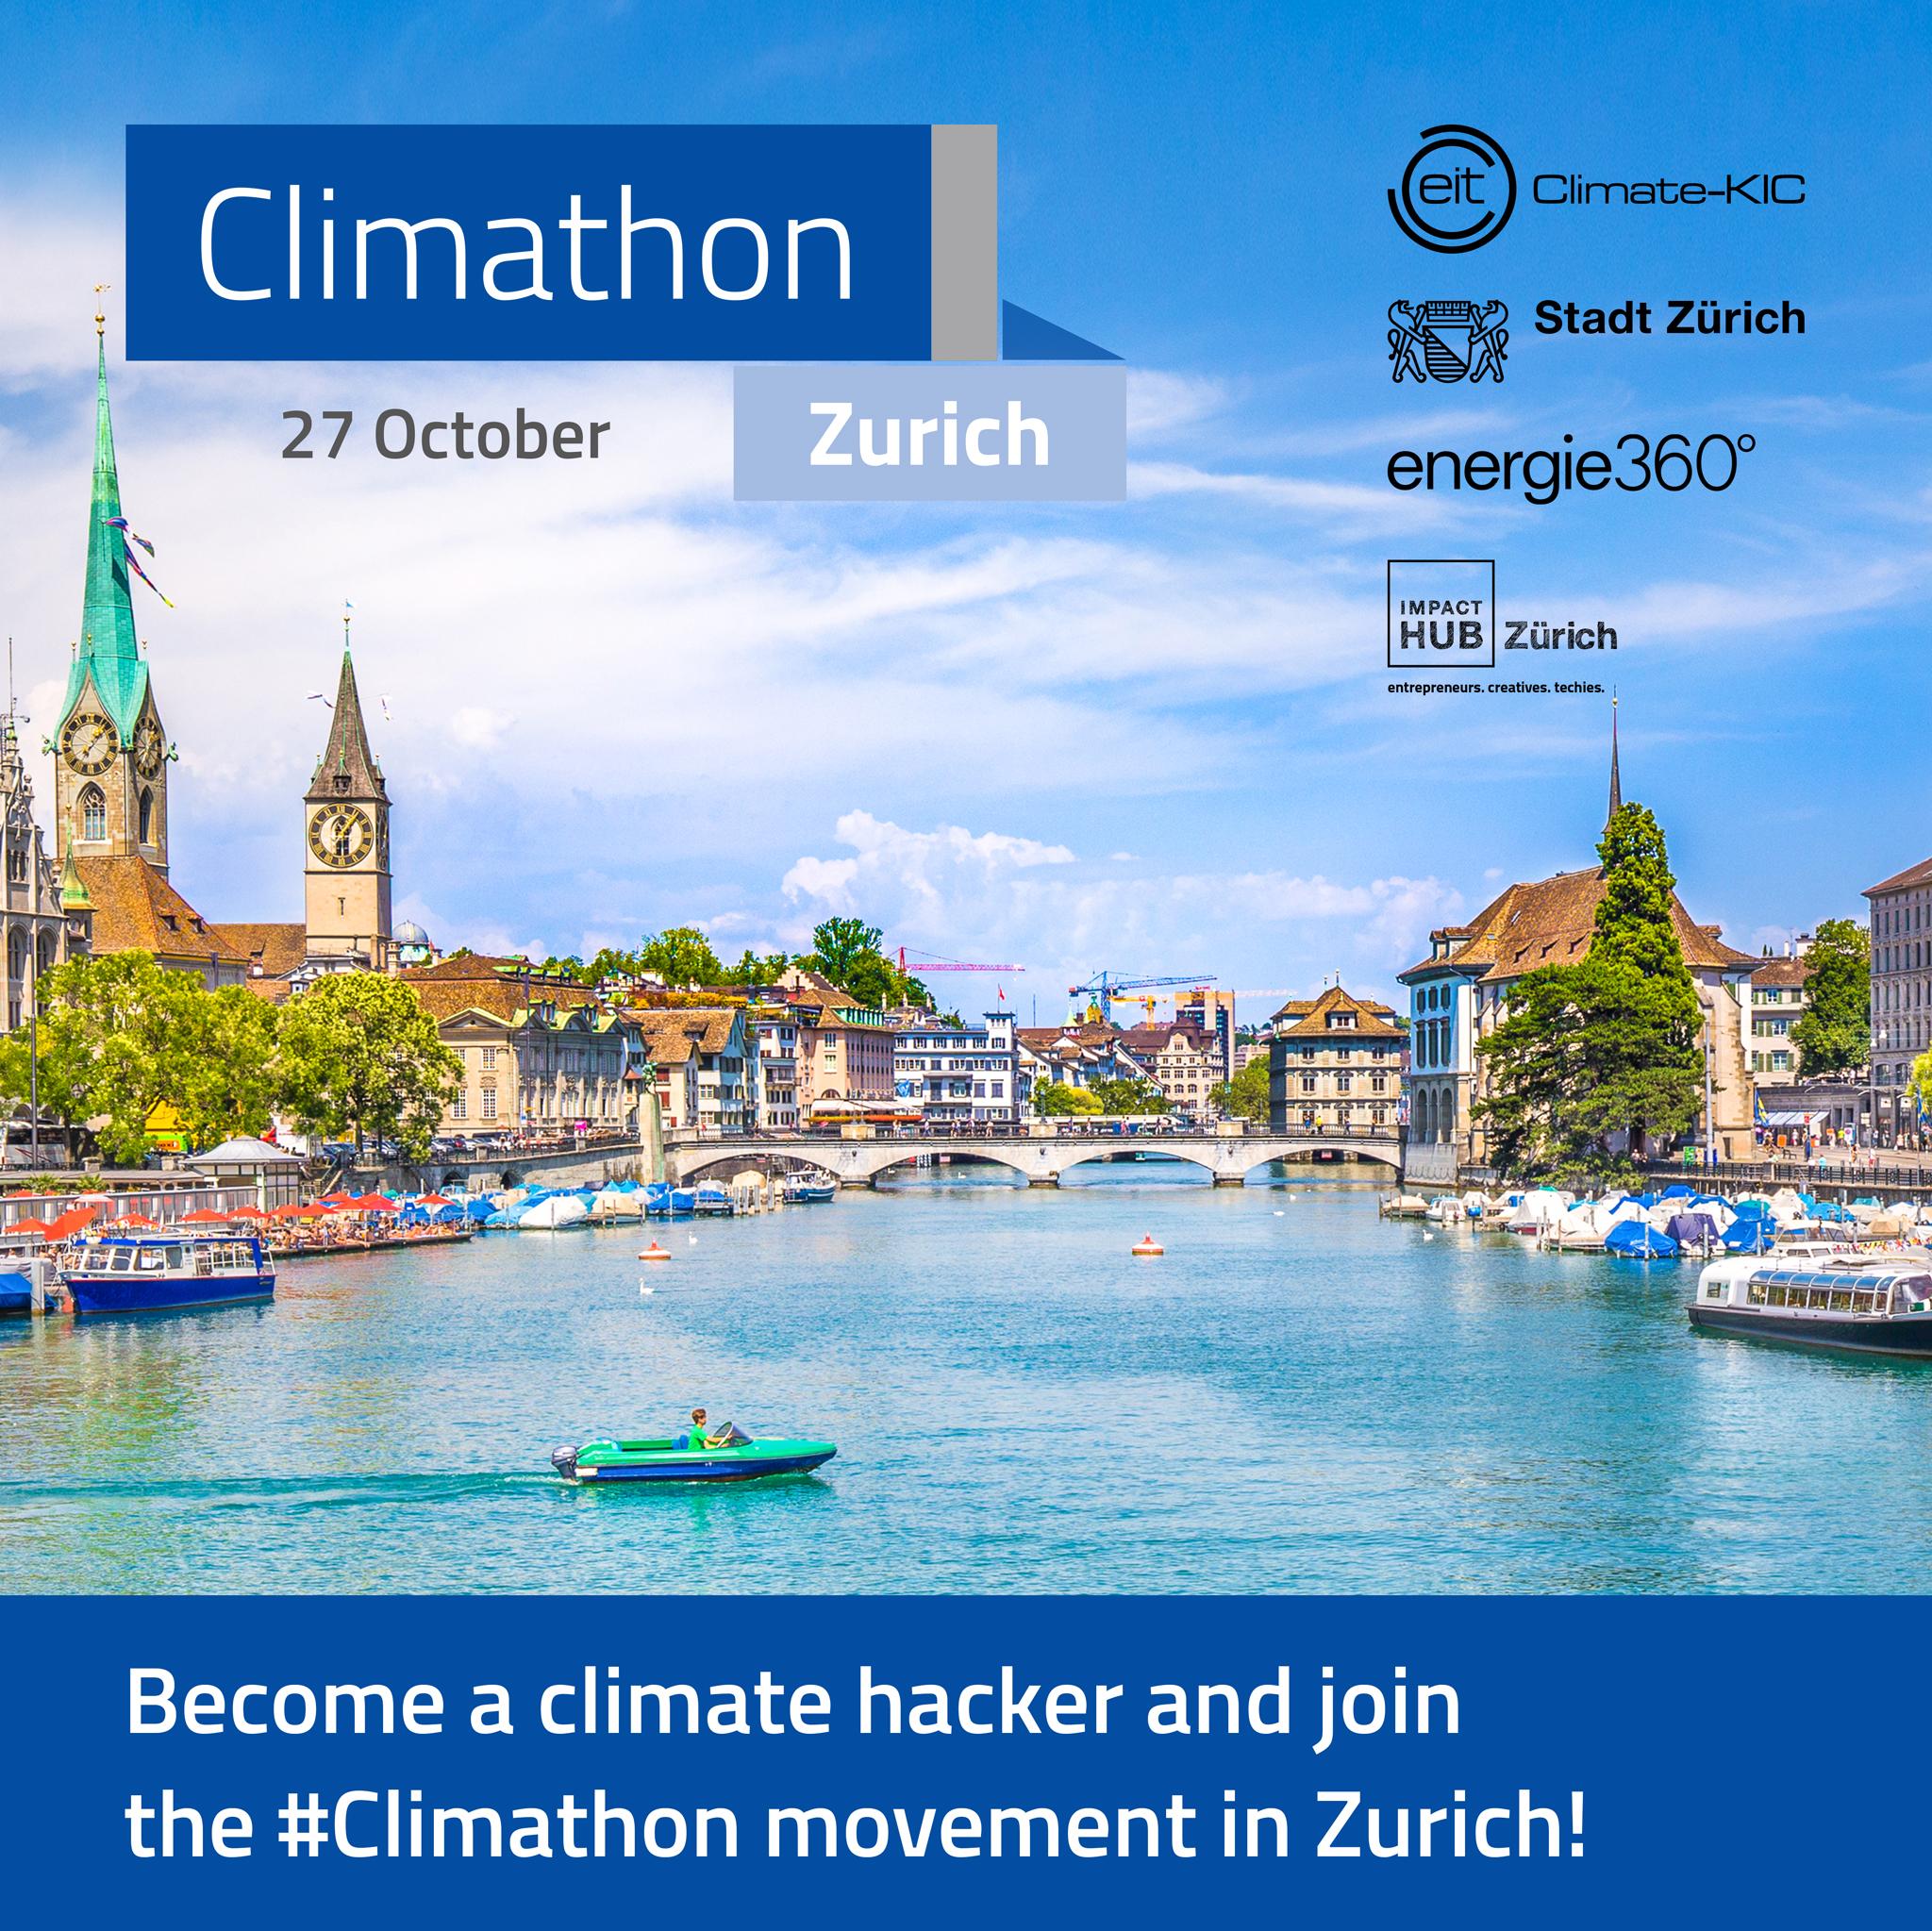 170906_J398-Climathon-Quadrat-Zurich.jpg